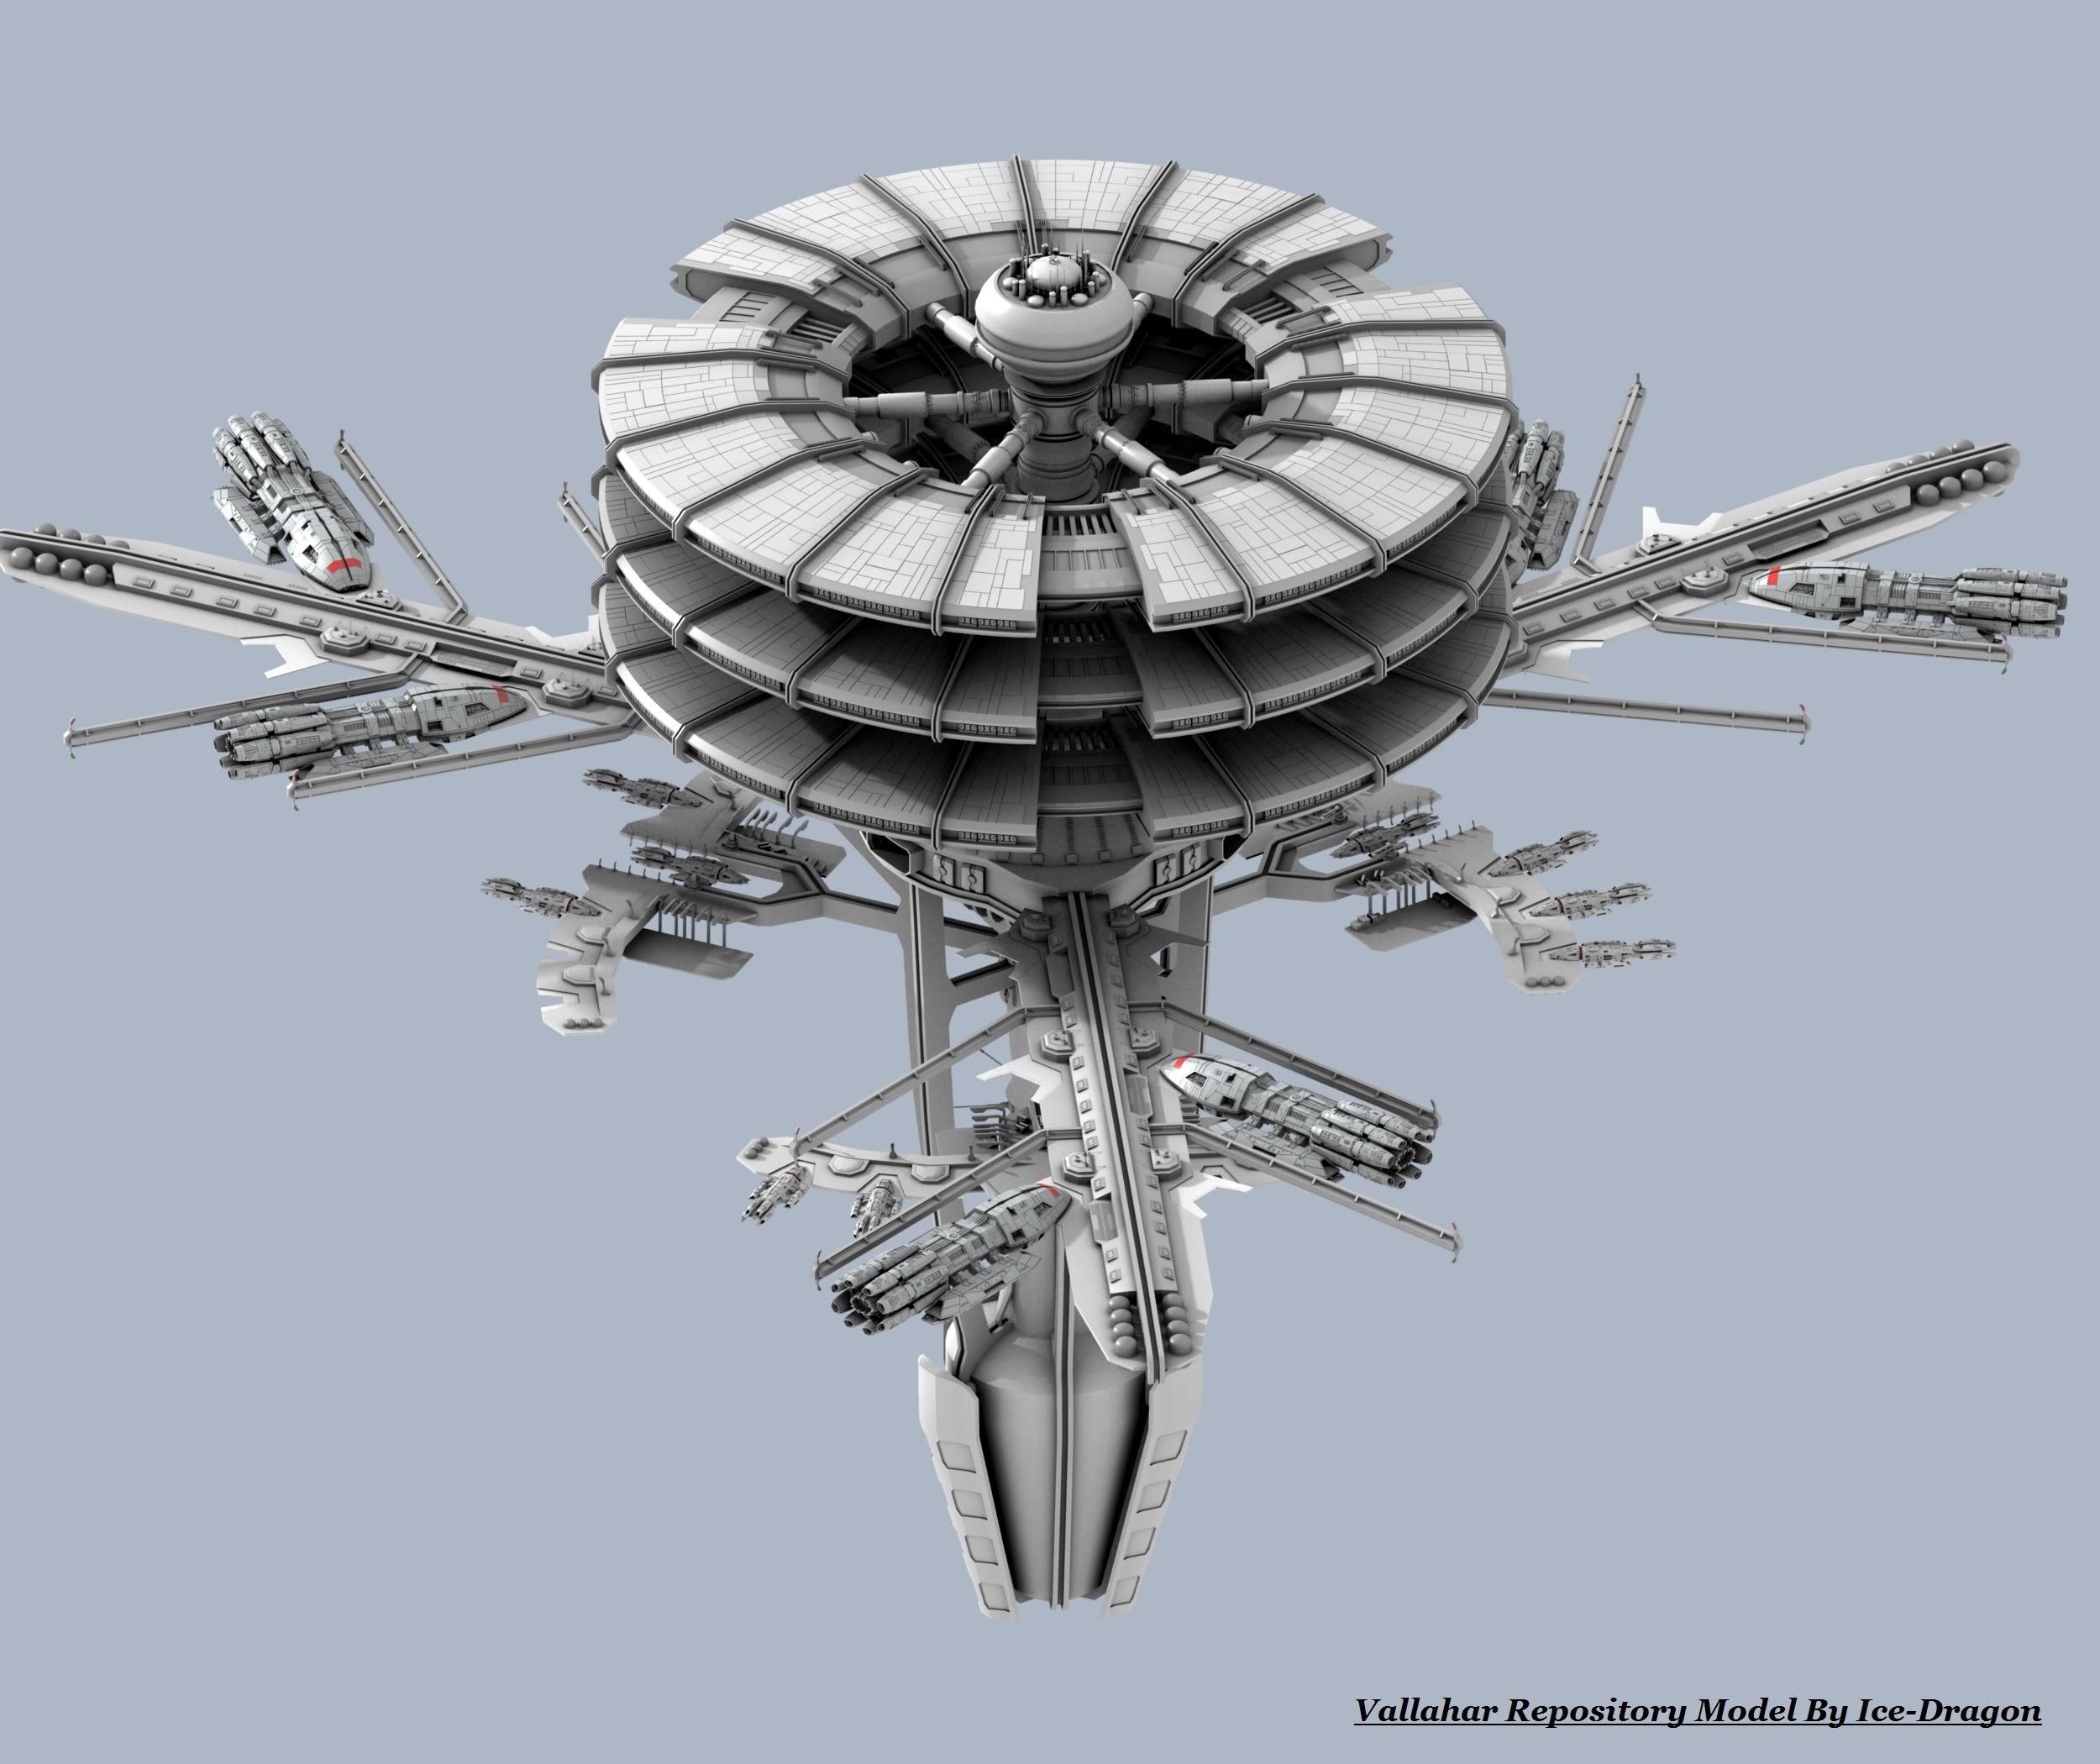 Zoic CGI model of Battlestar Galactica | Battlestar ...  |Battlestar Galactica Spacecraft